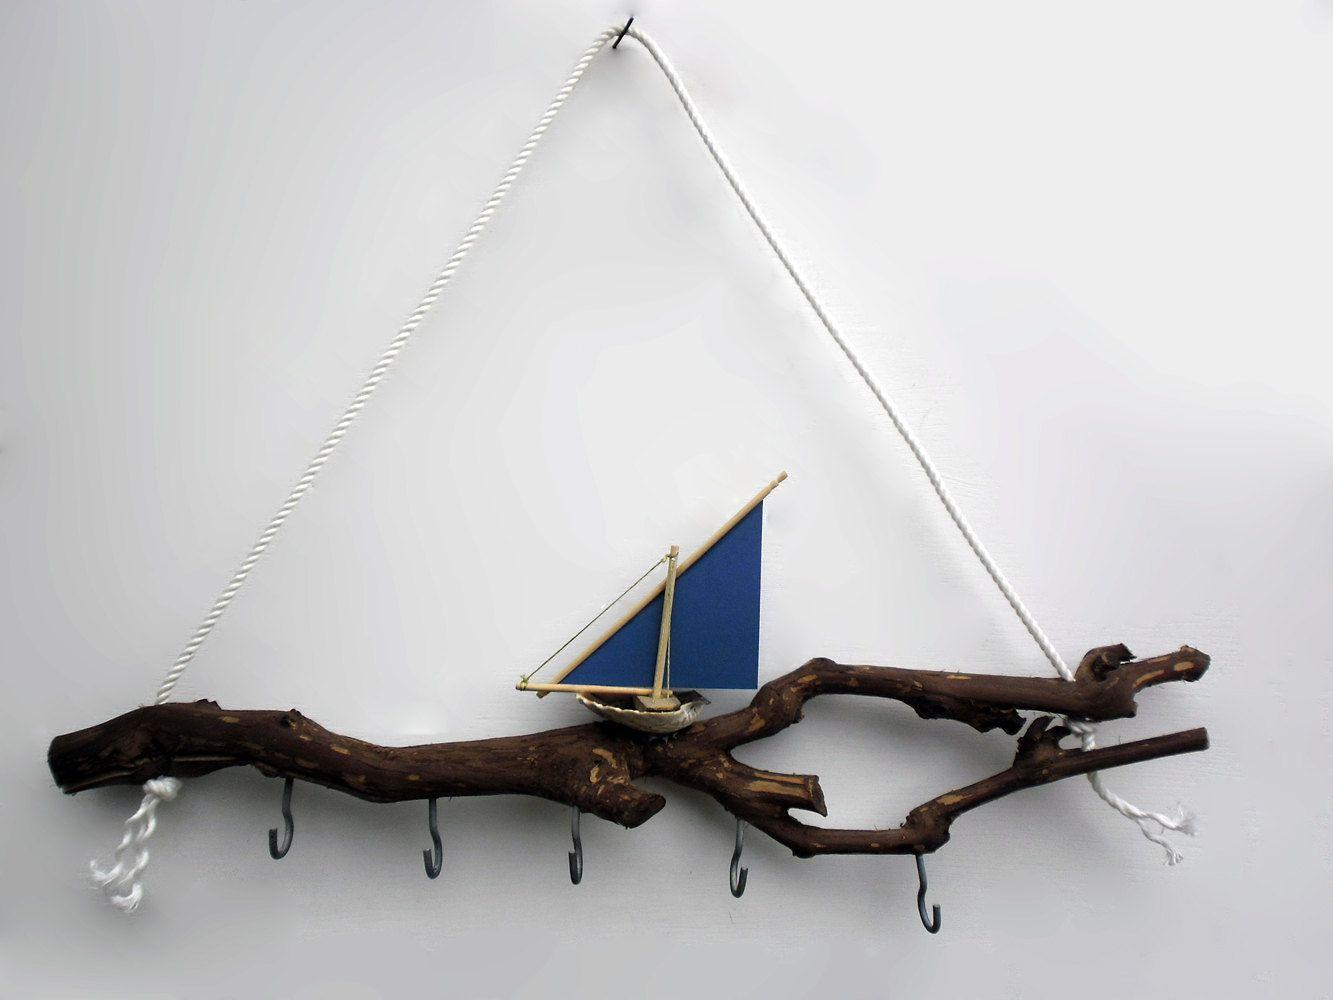 key rack, key hook, key holder - sailboat on the waves. $35.00, via Etsy.